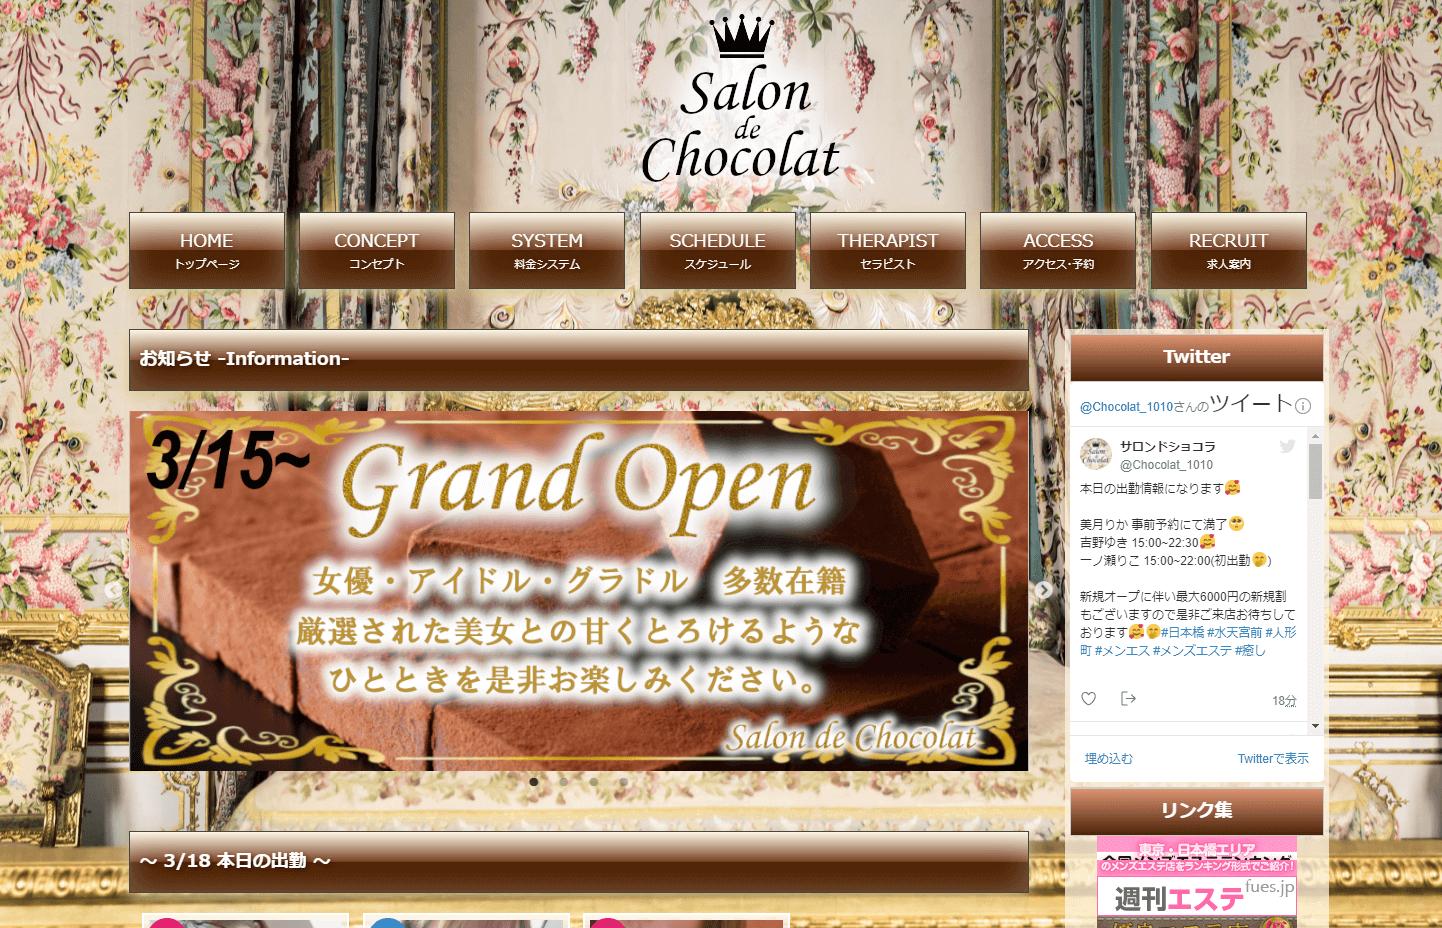 Salon de Chocolate(サロン・ド・ショコラ)